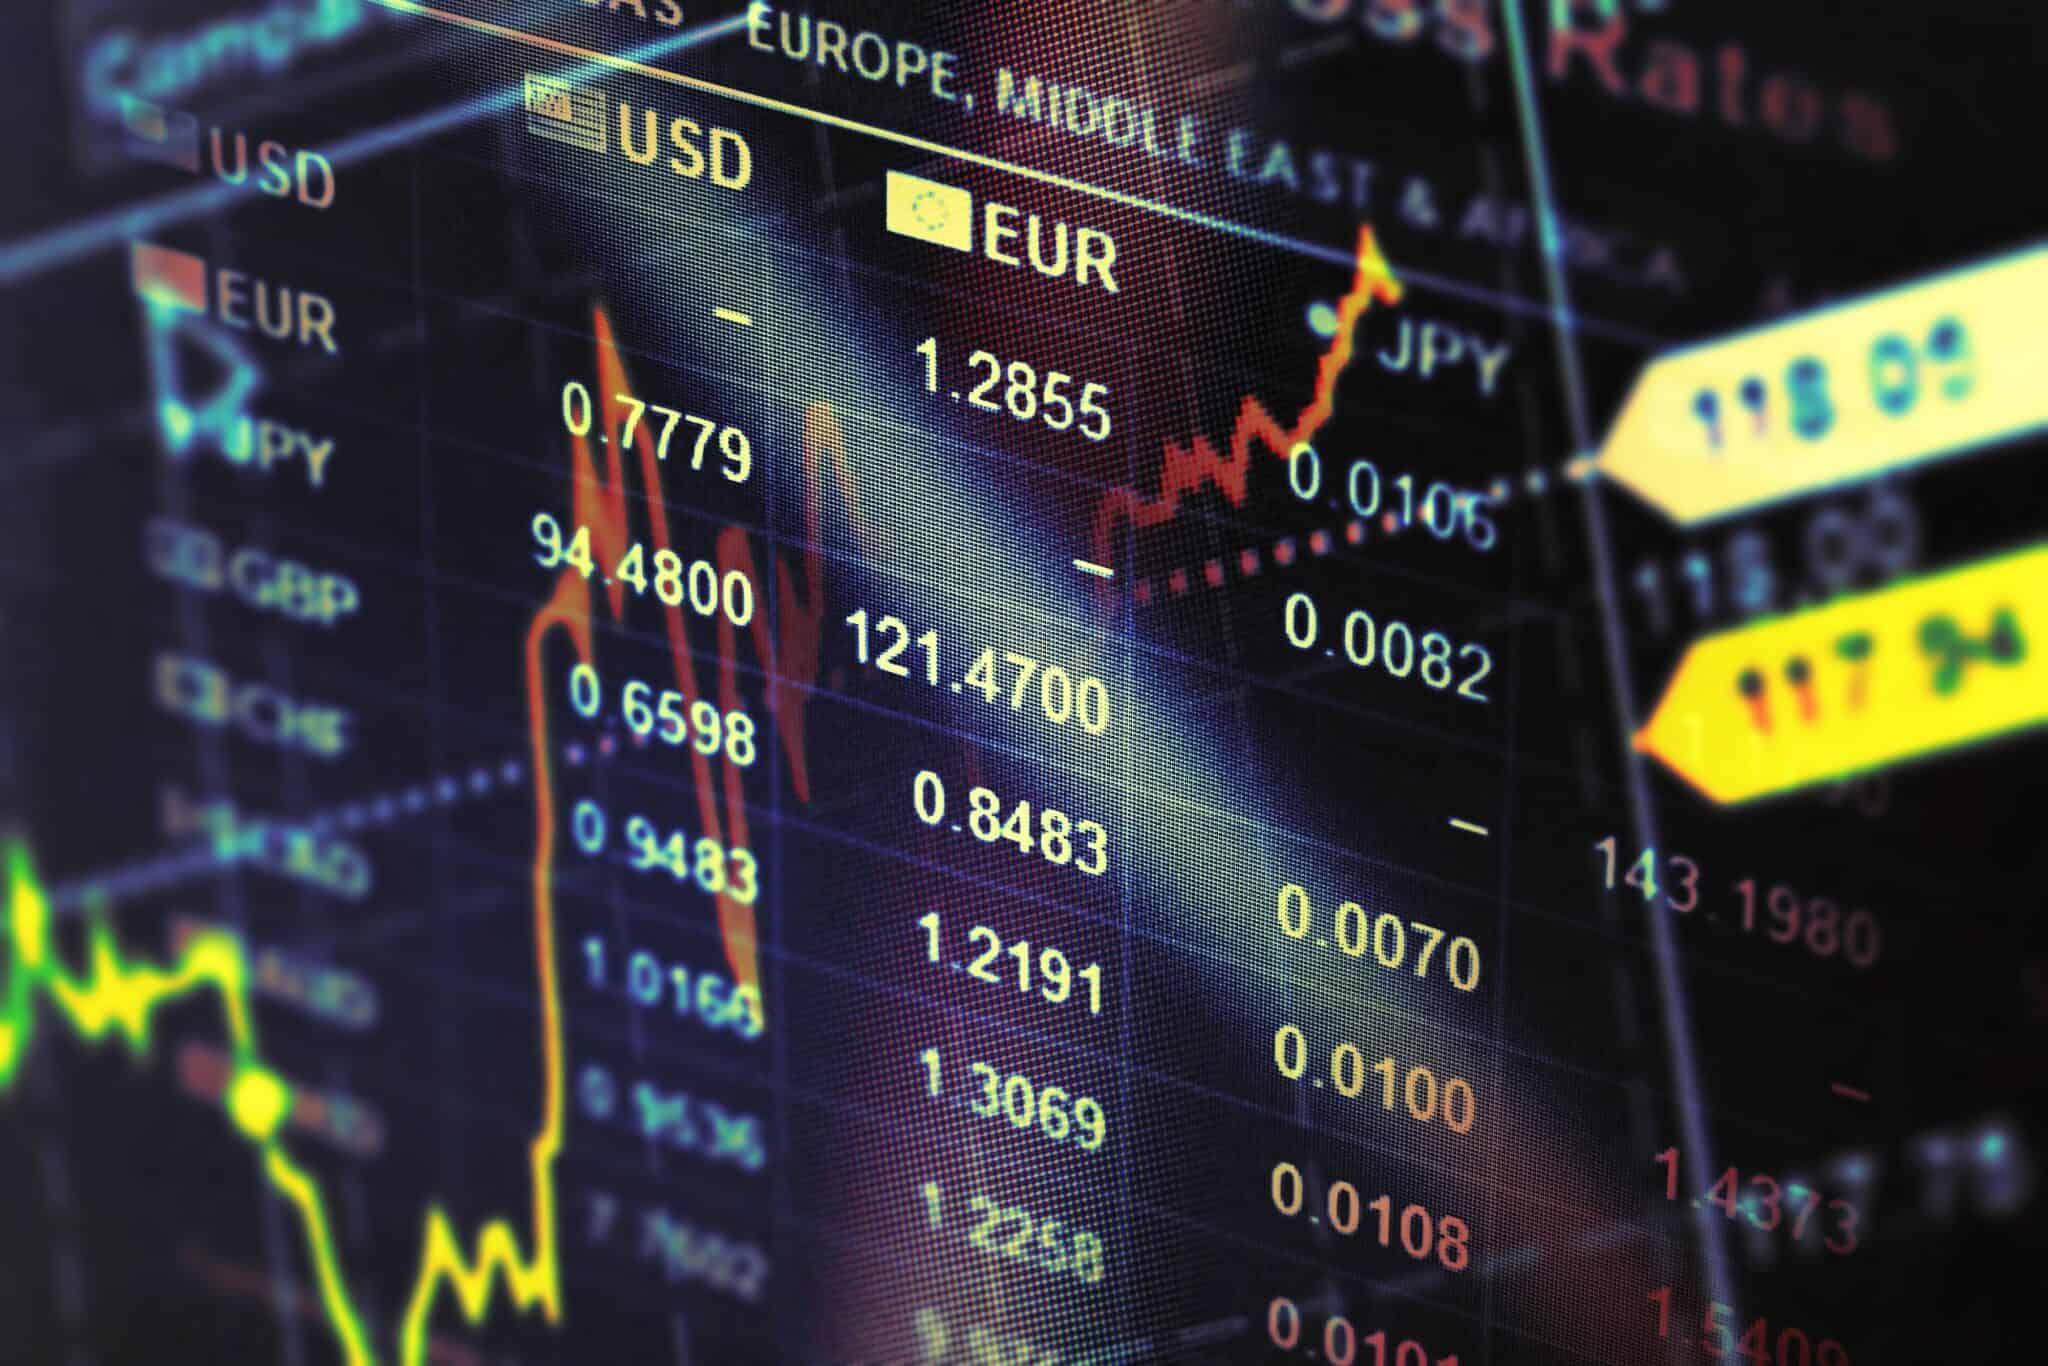 Conheça a ESTER, a nova taxa do Banco Central Europeu